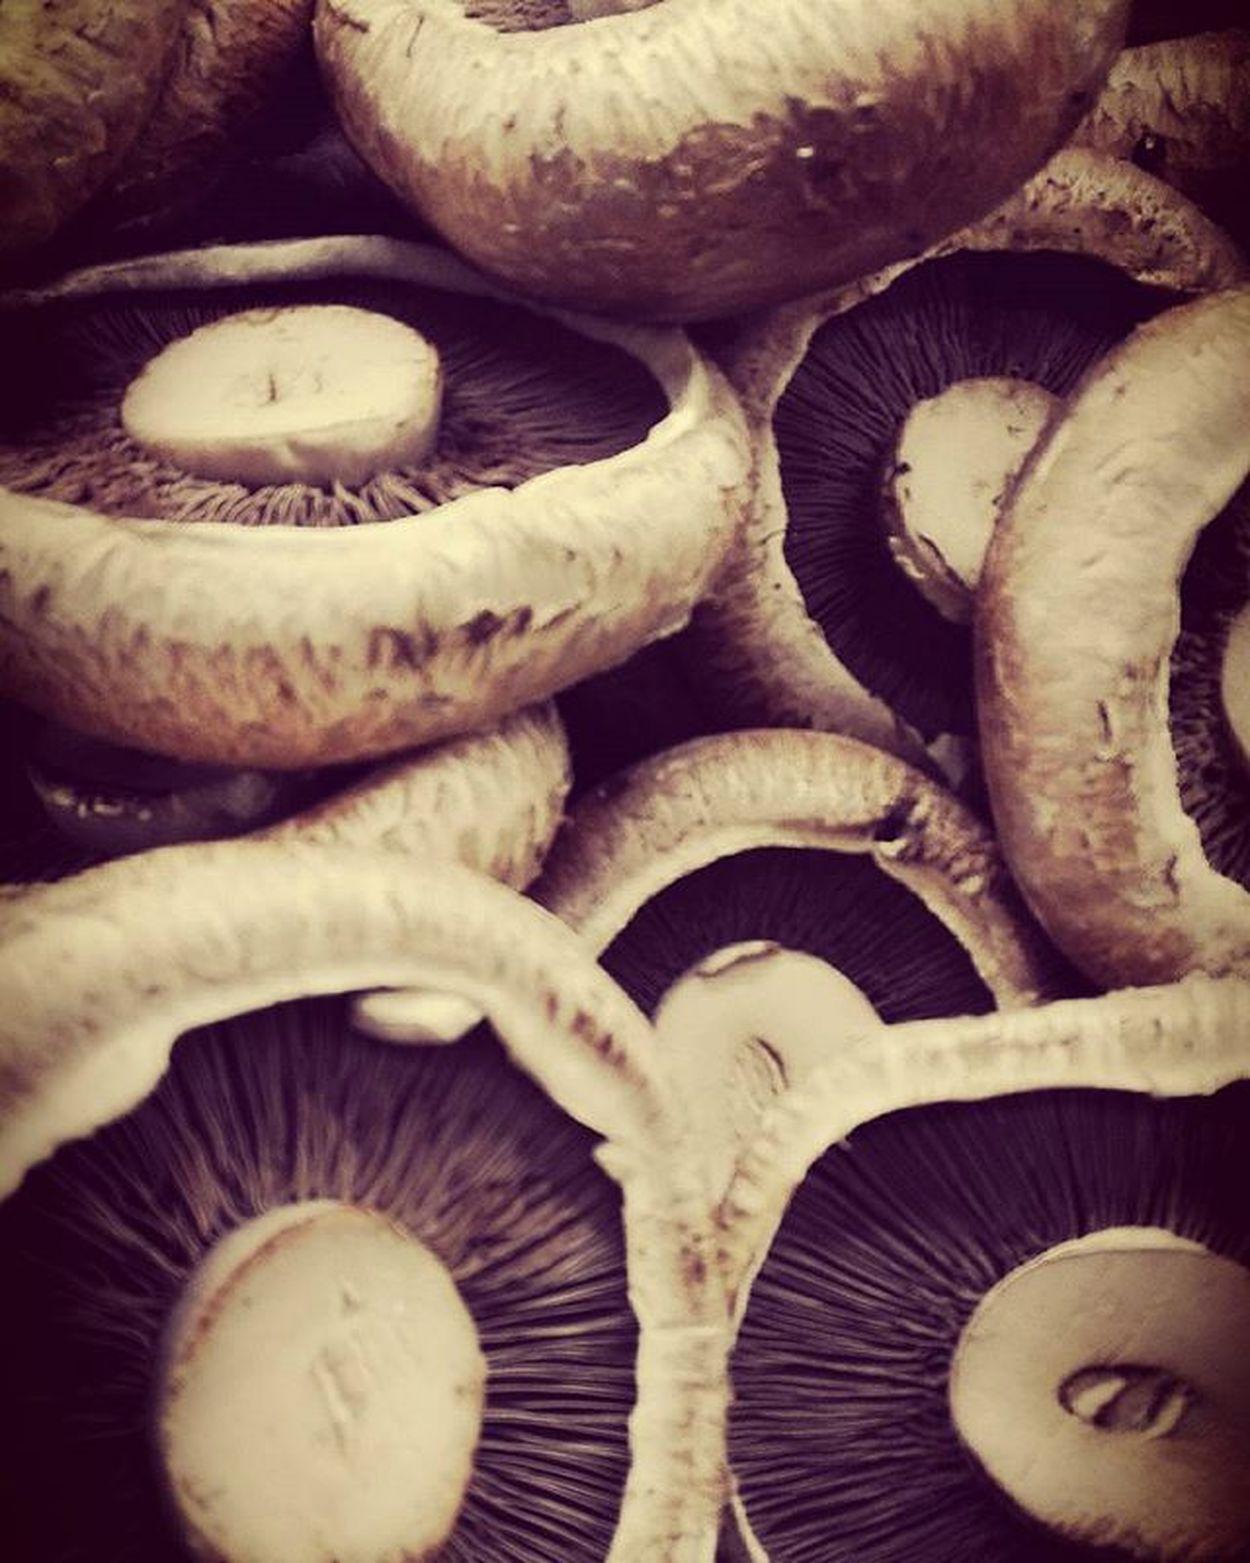 Changingplate Wmm_brown Pocket_food 9vaga_food9 Mushrooms